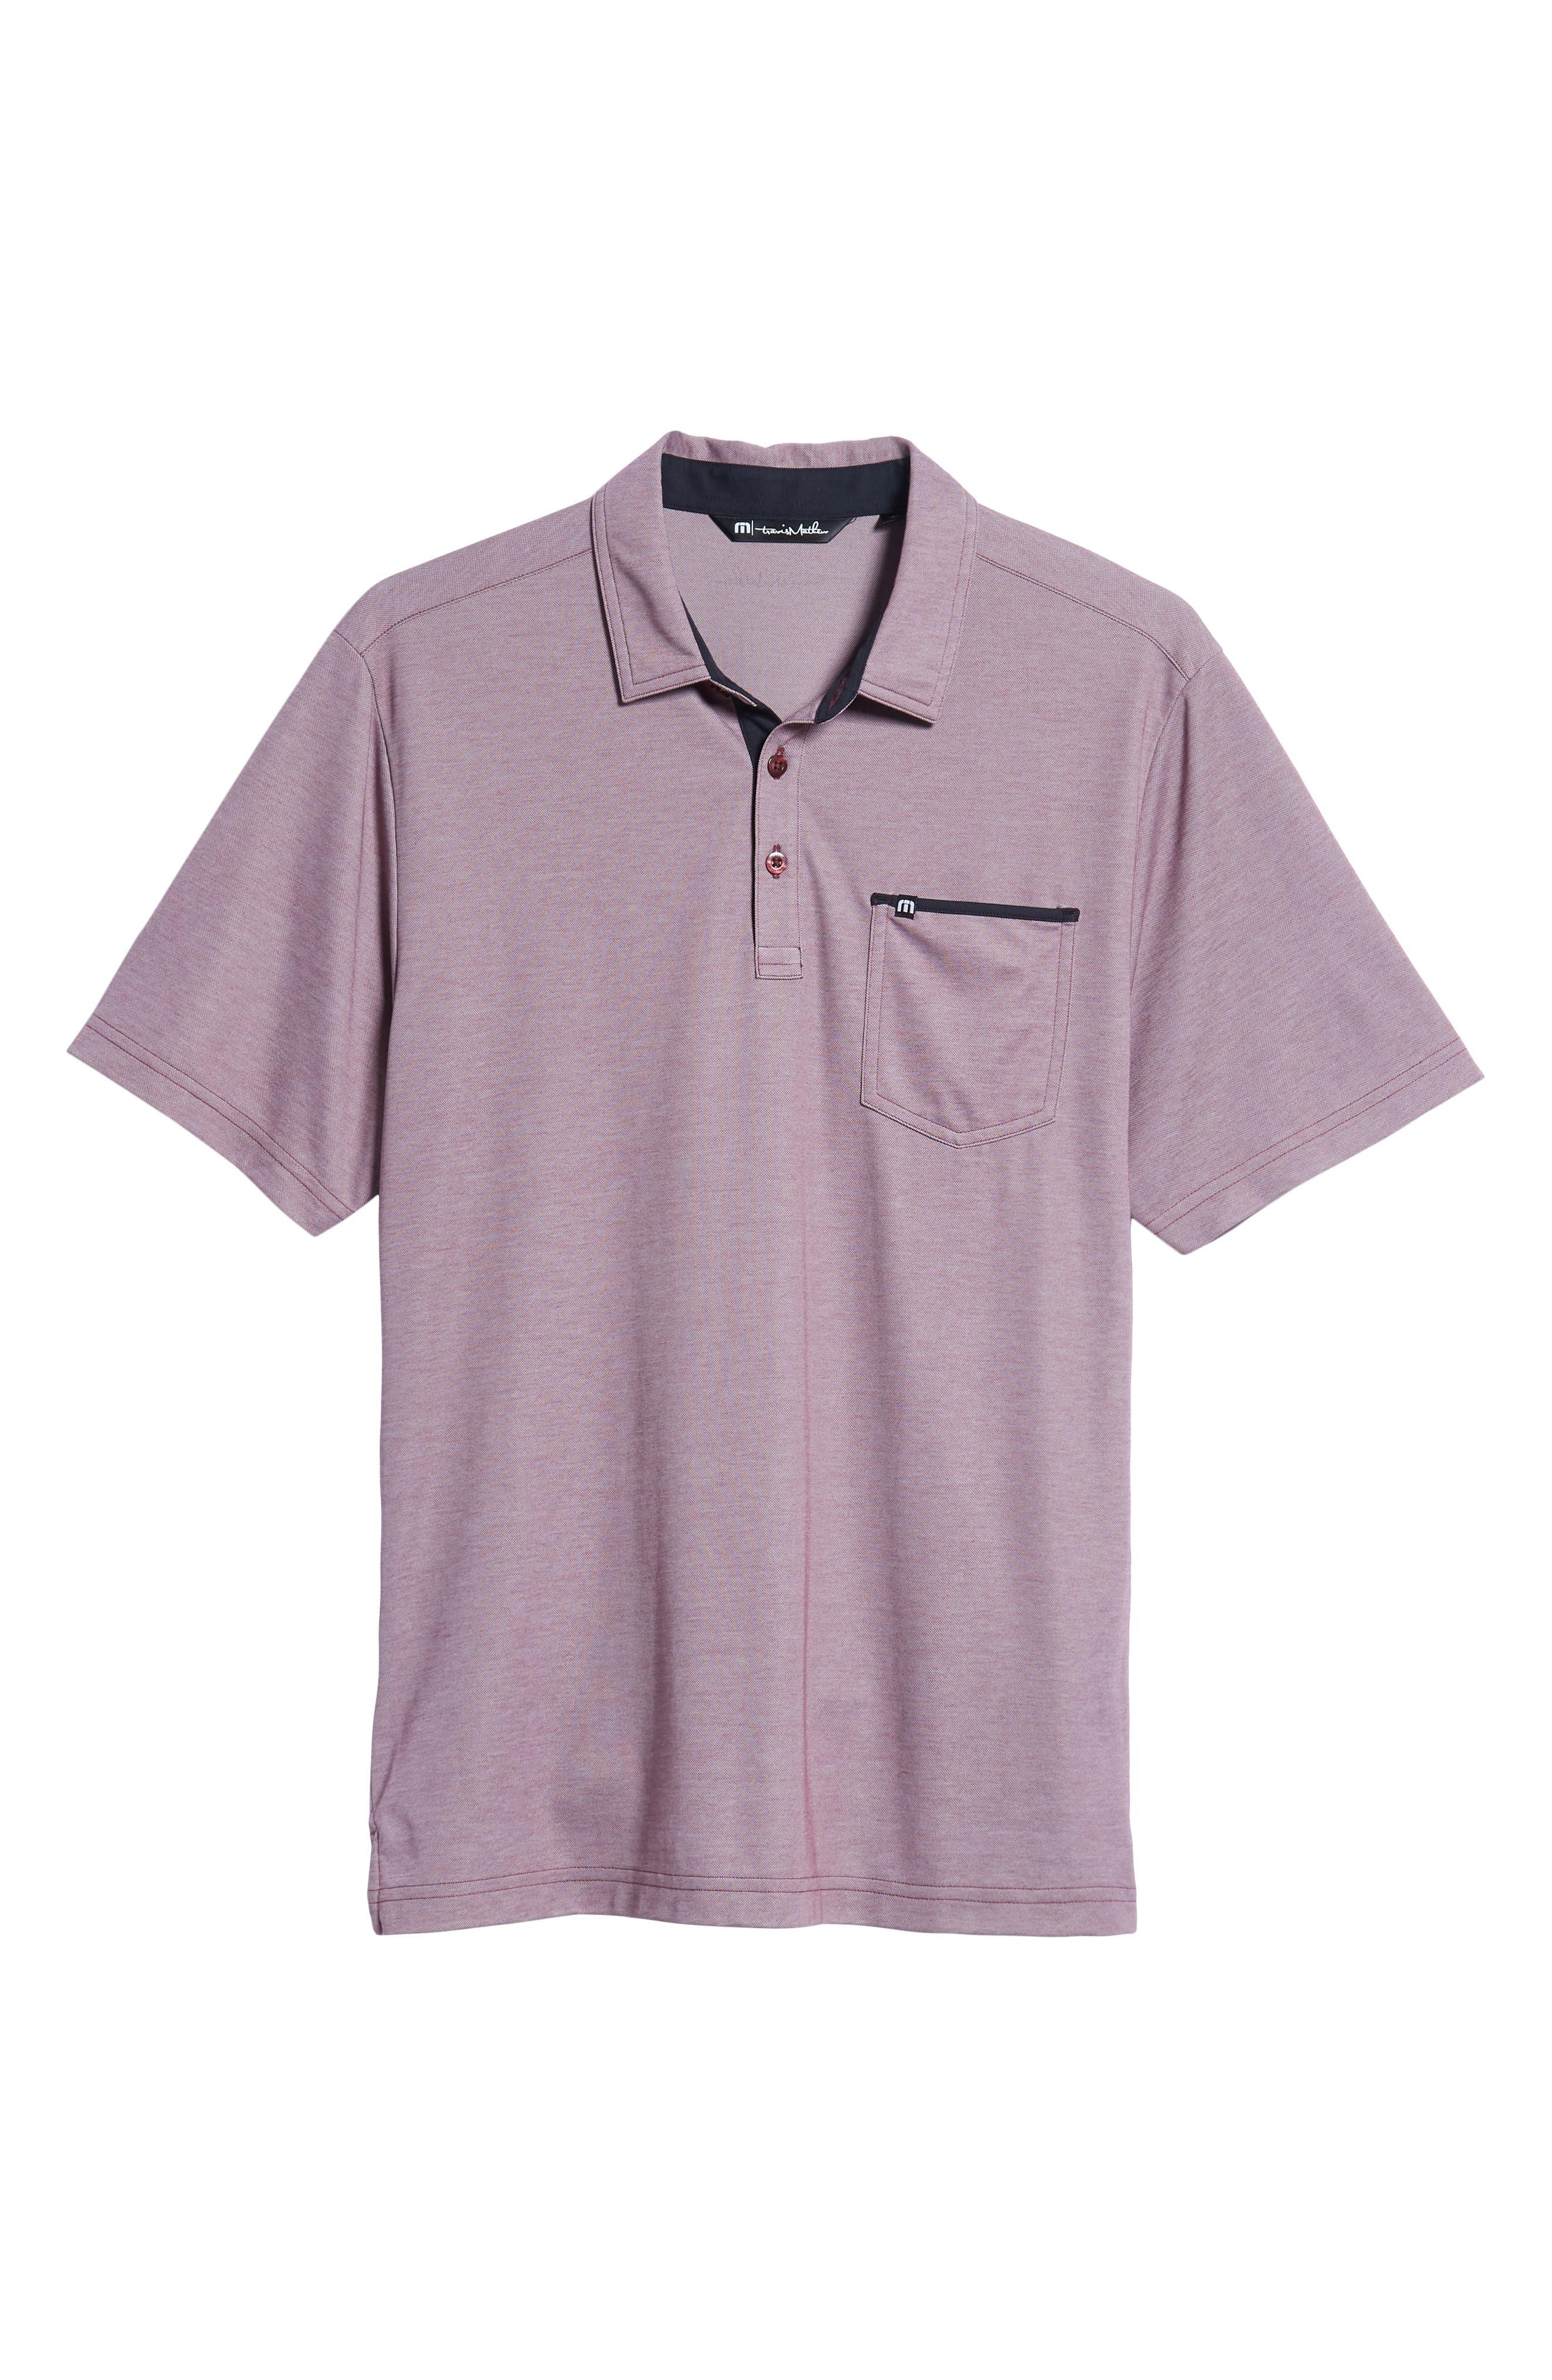 TRAVIS MATHEW,                             Tonk Regular Fit Polo Shirt,                             Alternate thumbnail 6, color,                             600